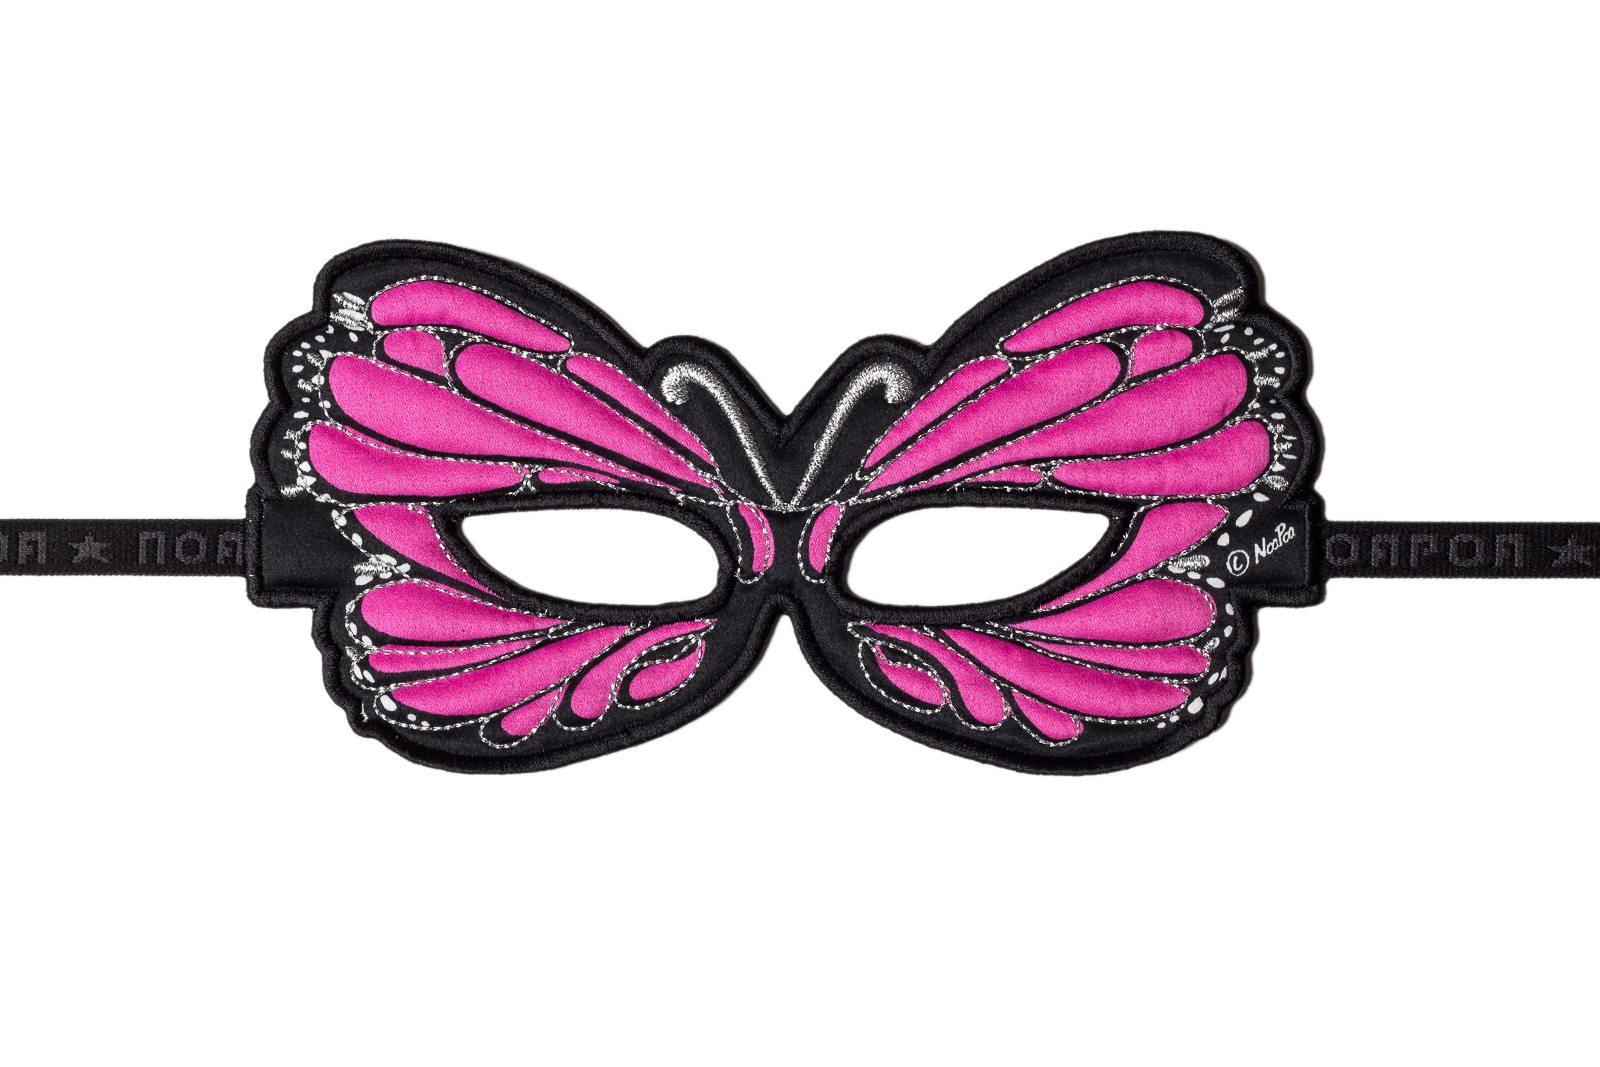 butterfly pink fabric mask jasabyn. Black Bedroom Furniture Sets. Home Design Ideas